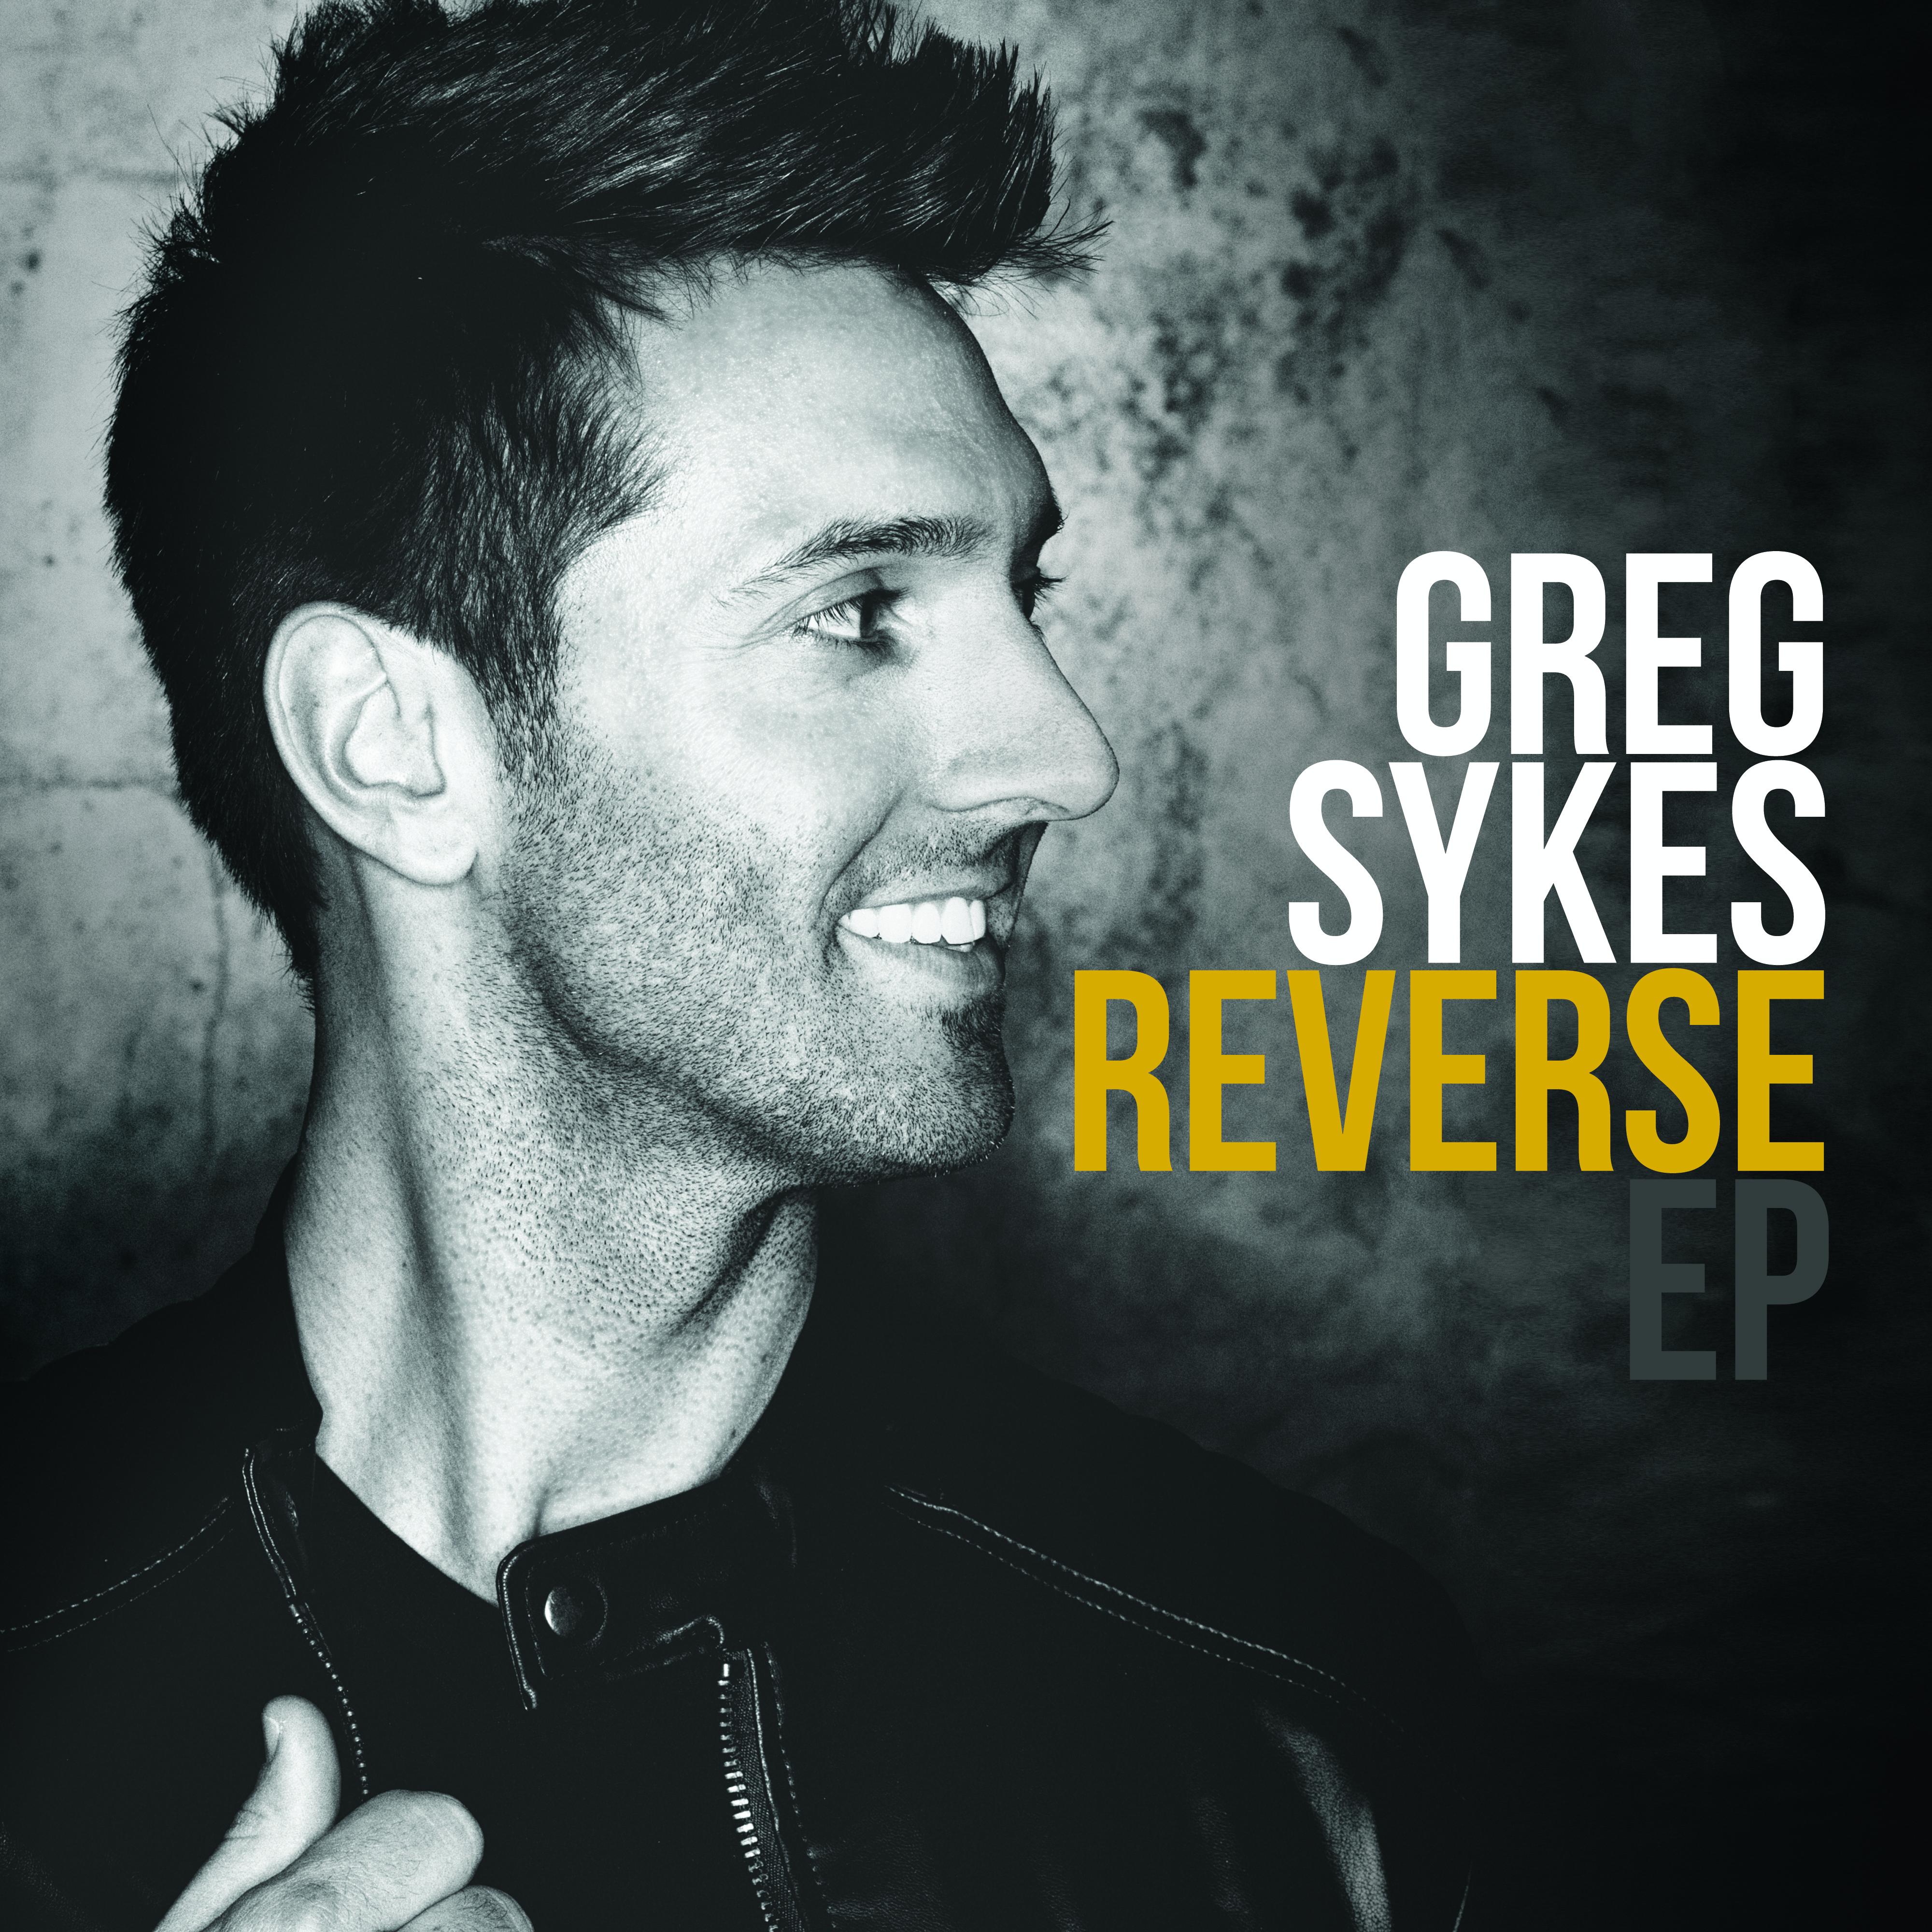 Greg Sykes_Reverse EP_Cover